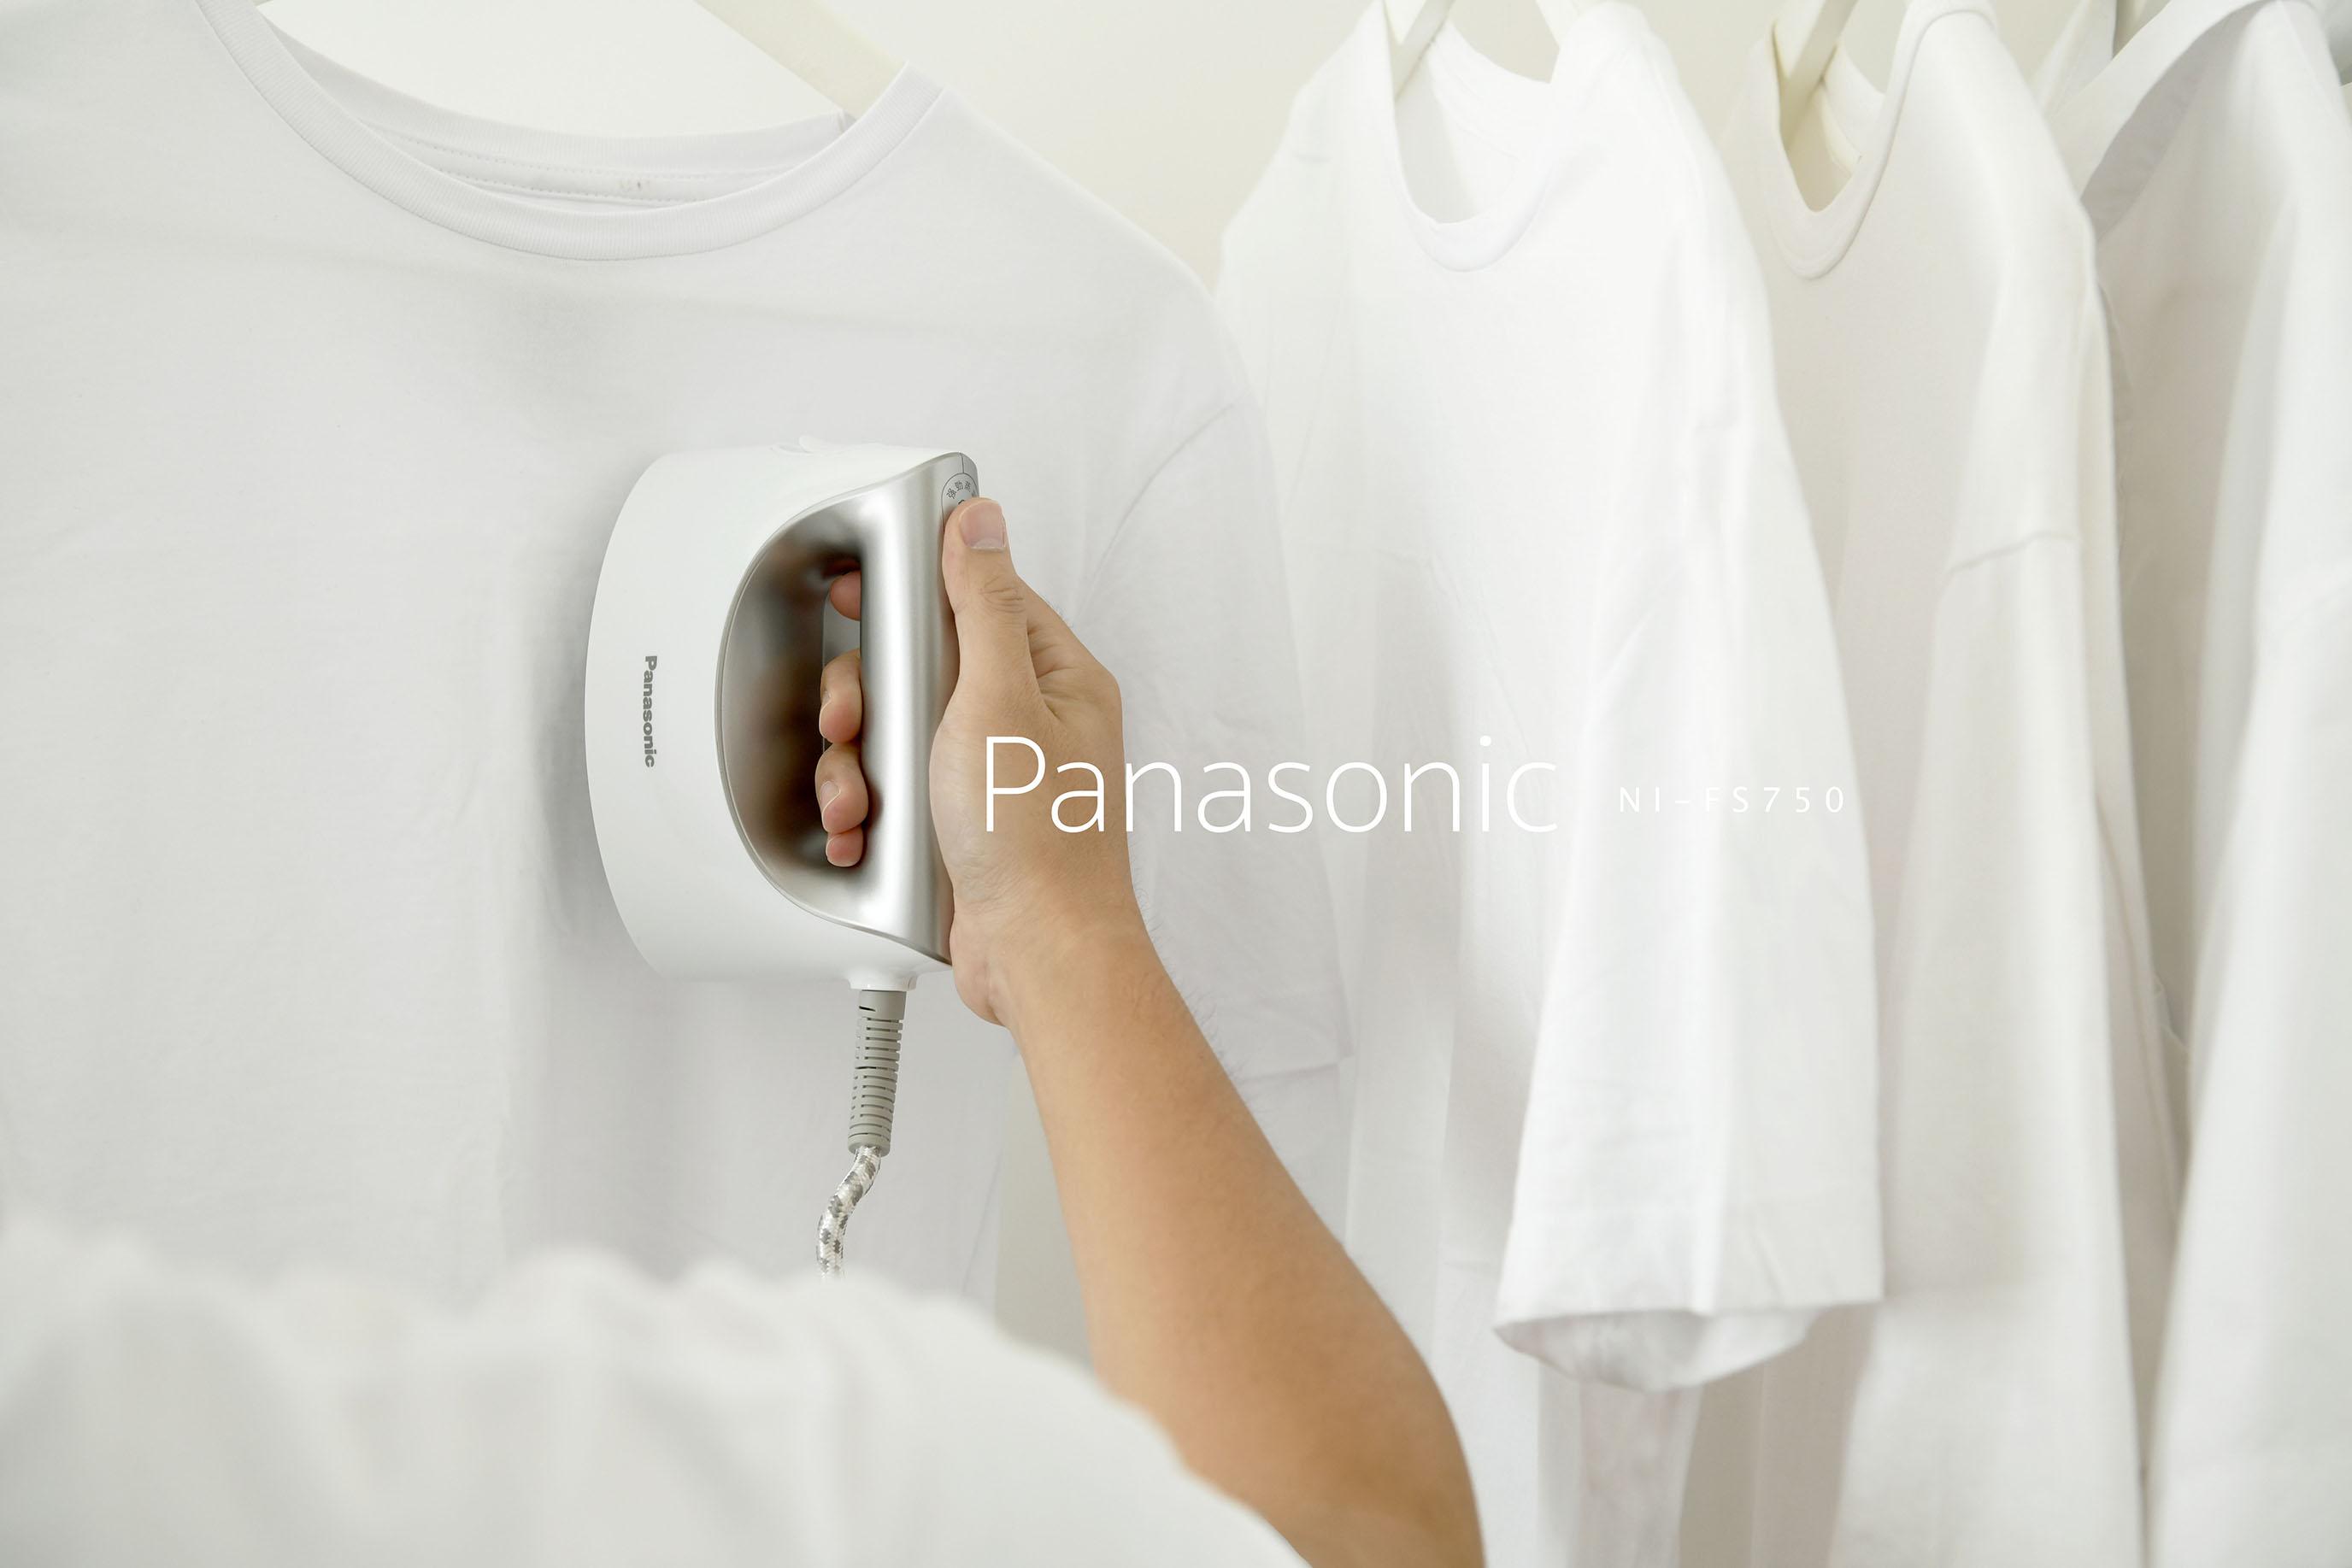 Panasonic 蒸氣電熨斗 NI-FS750